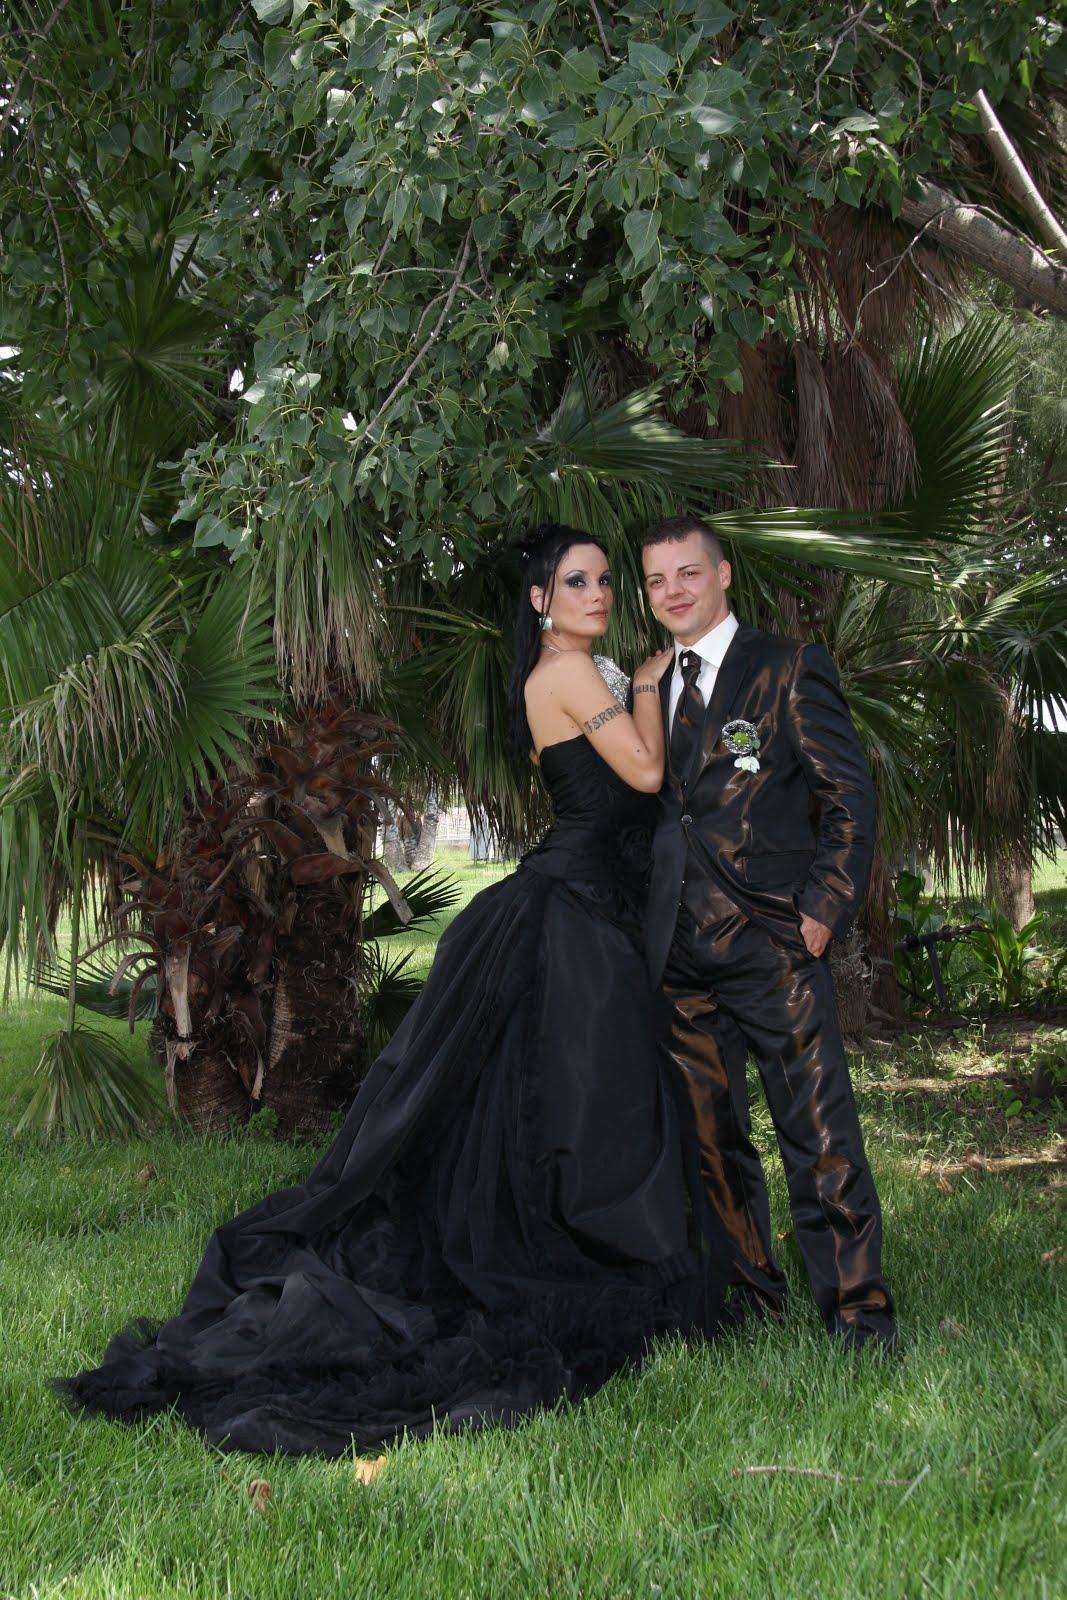 Married in black